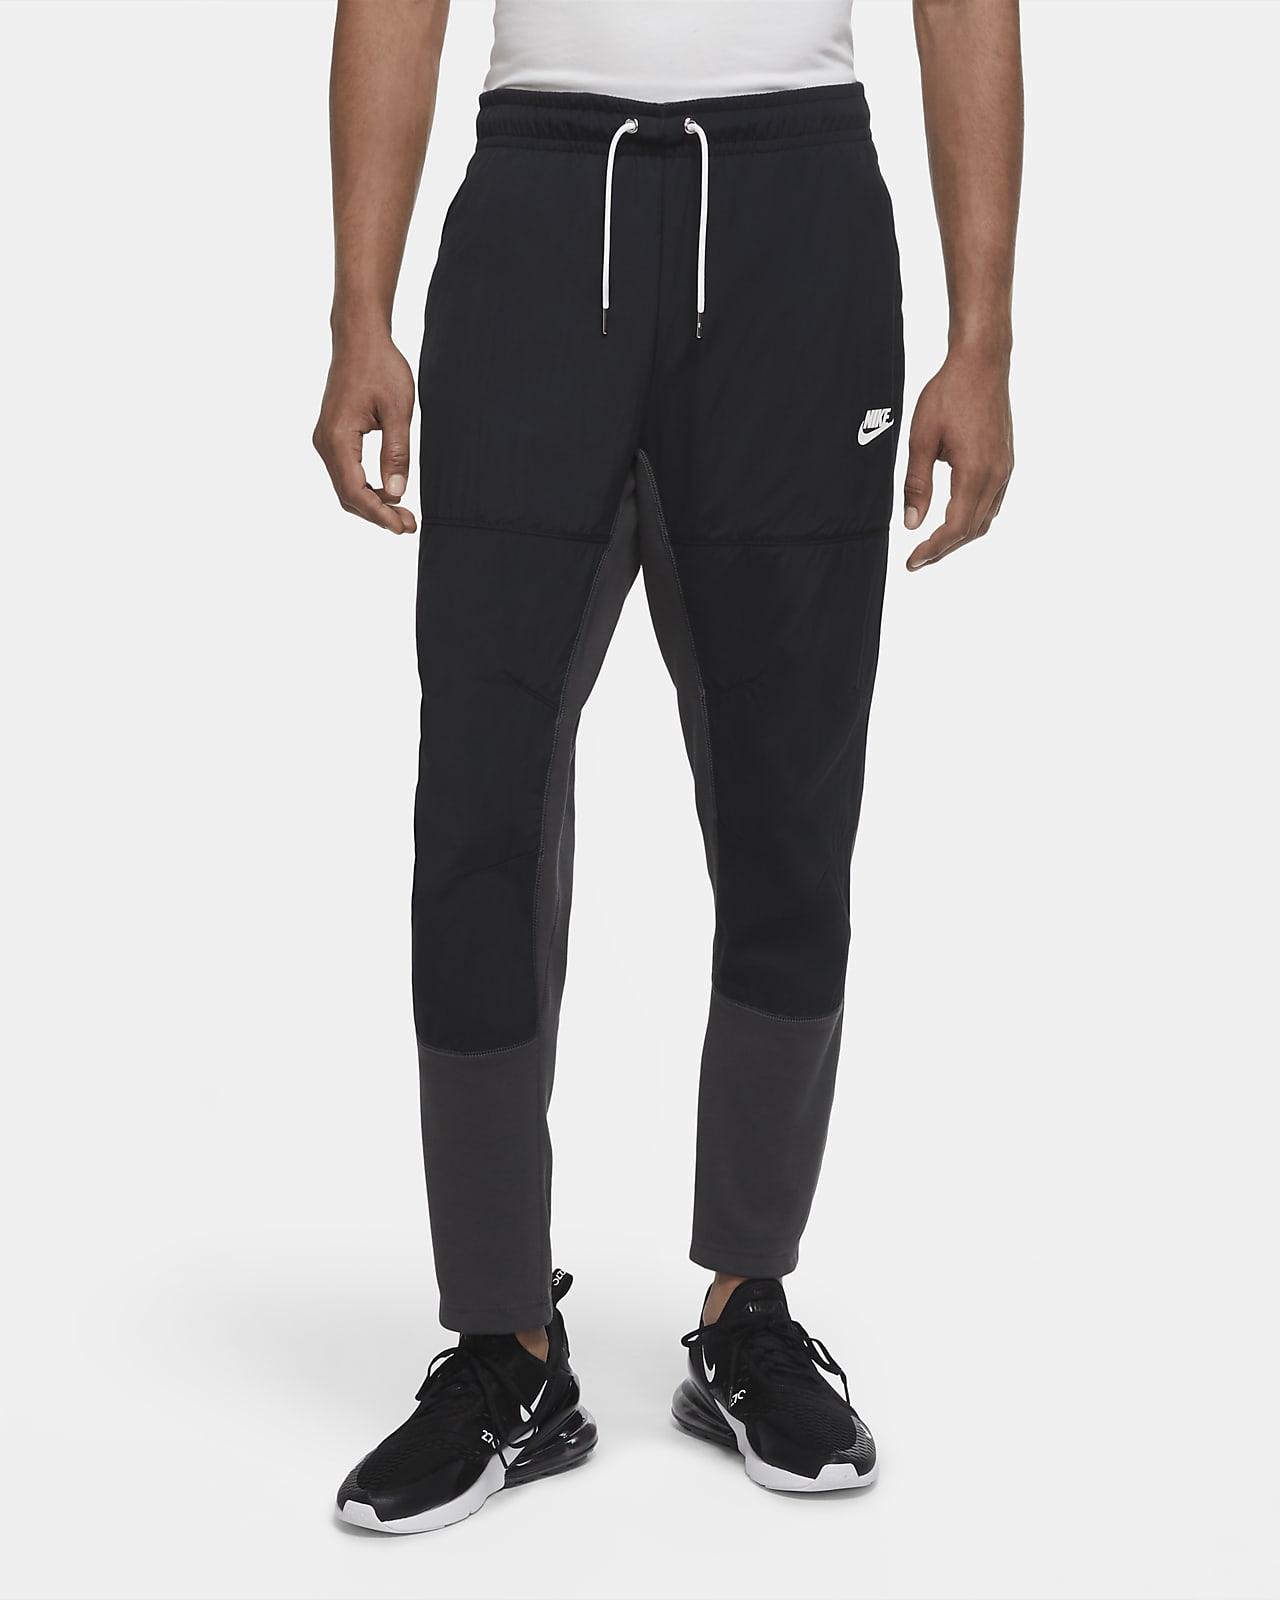 Byxor Nike Sportswear Modern Essentials Fleece för män